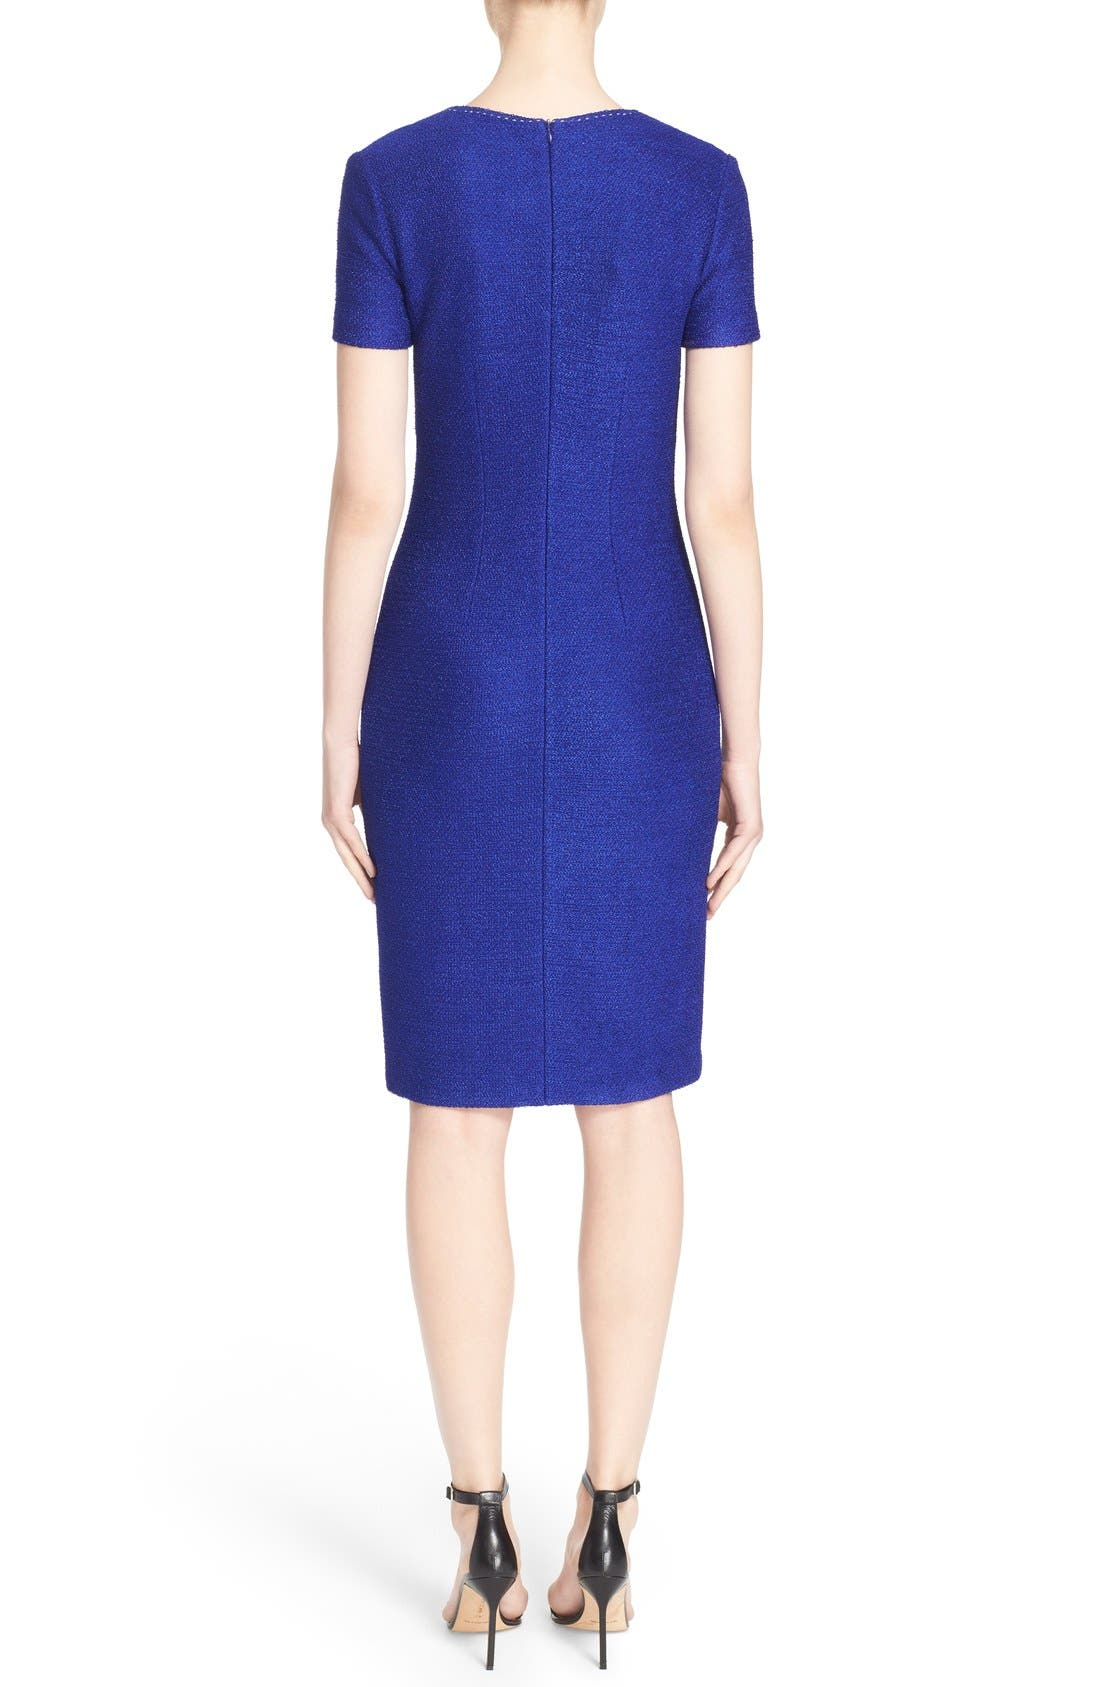 Alternate Image 2  - St. John Collection 'Newport' Knit Sheath Dress